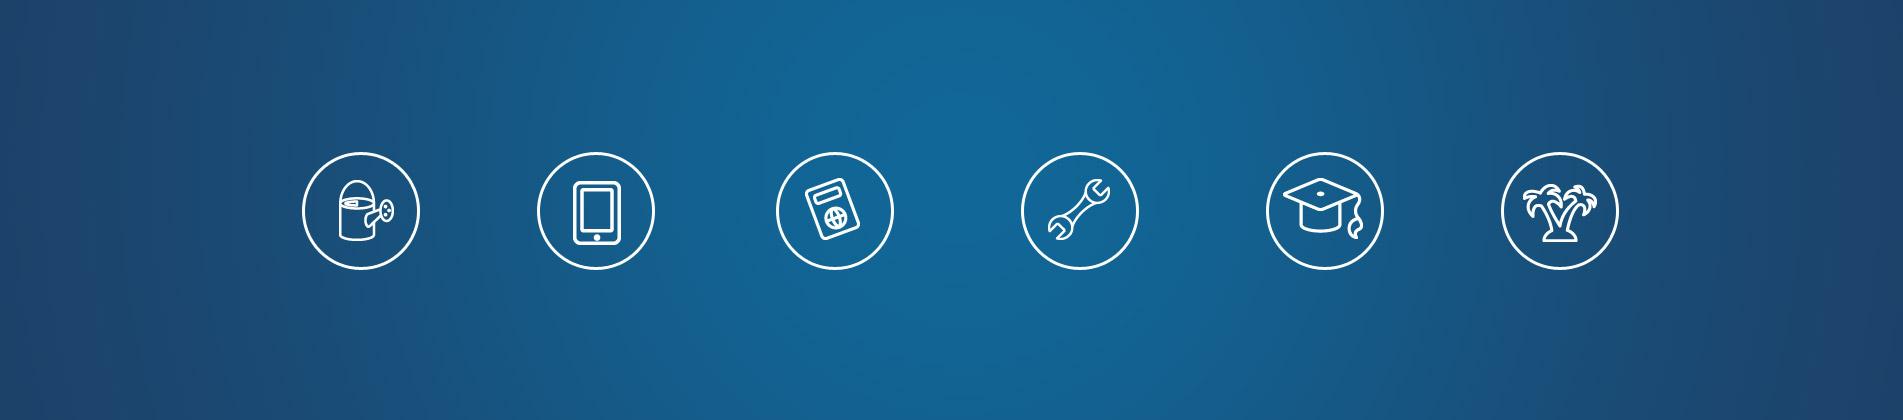 indywidual-icons2